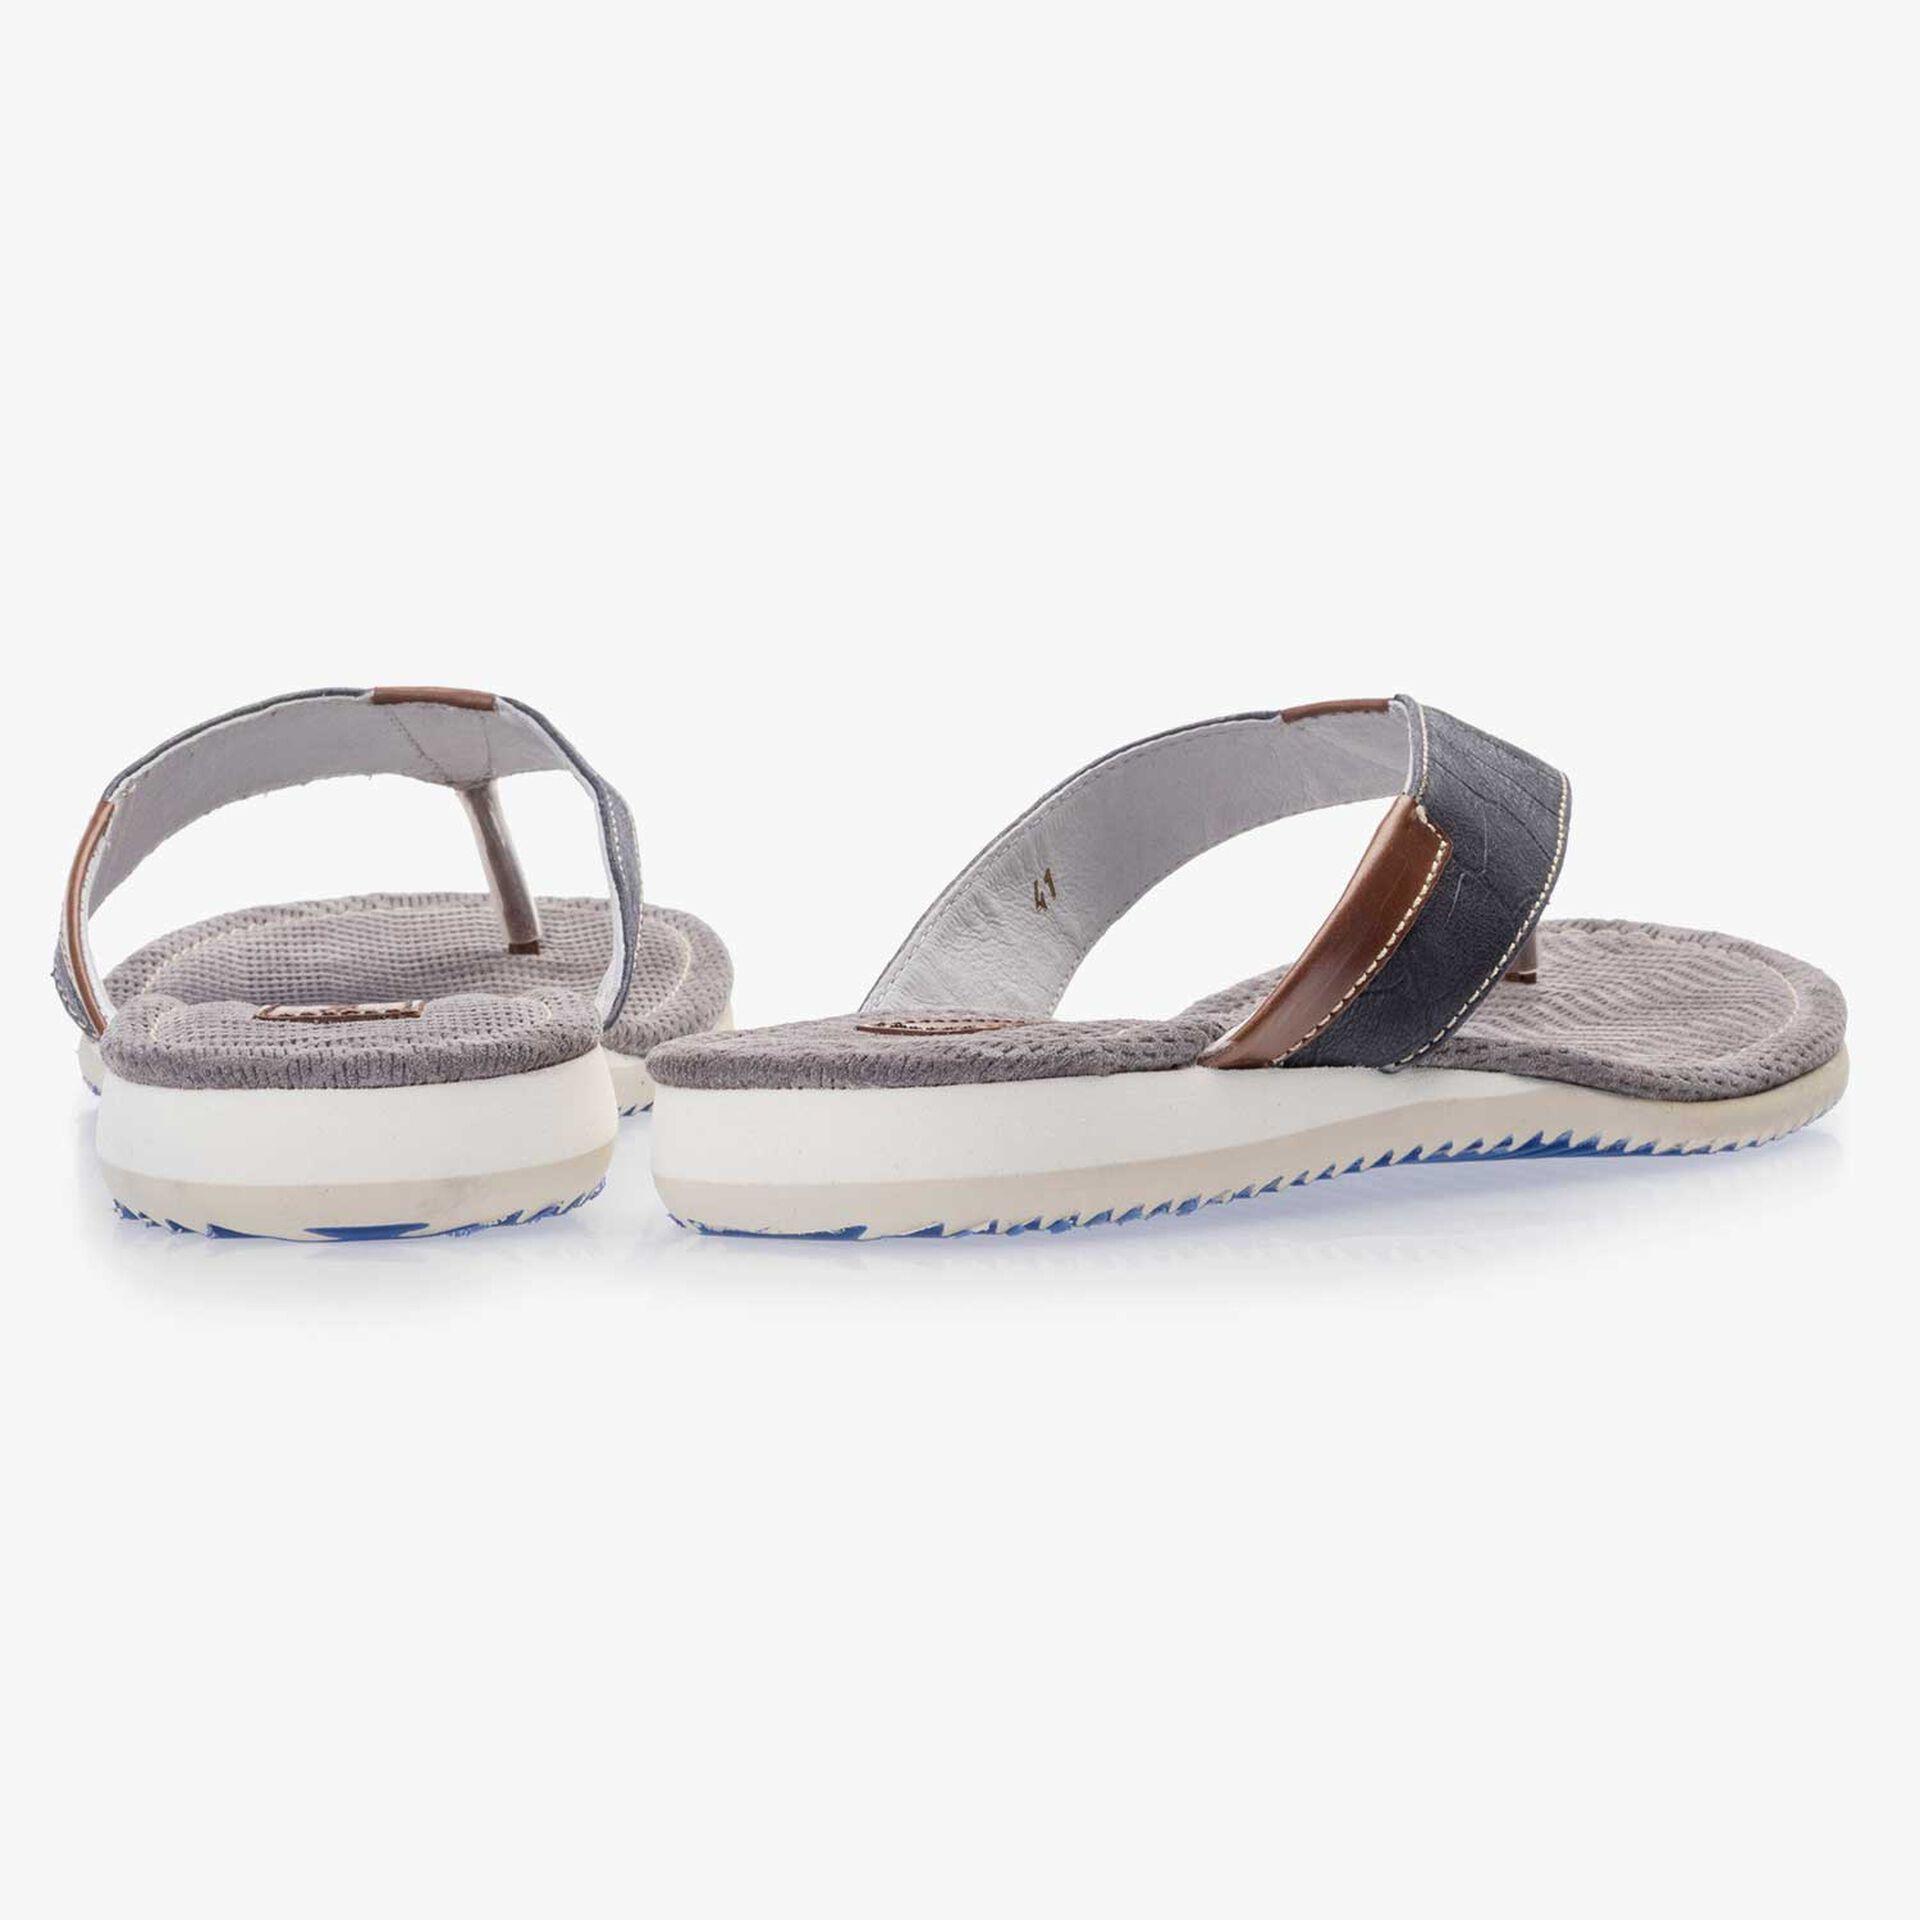 Dark blue leather thong slipper with croco print